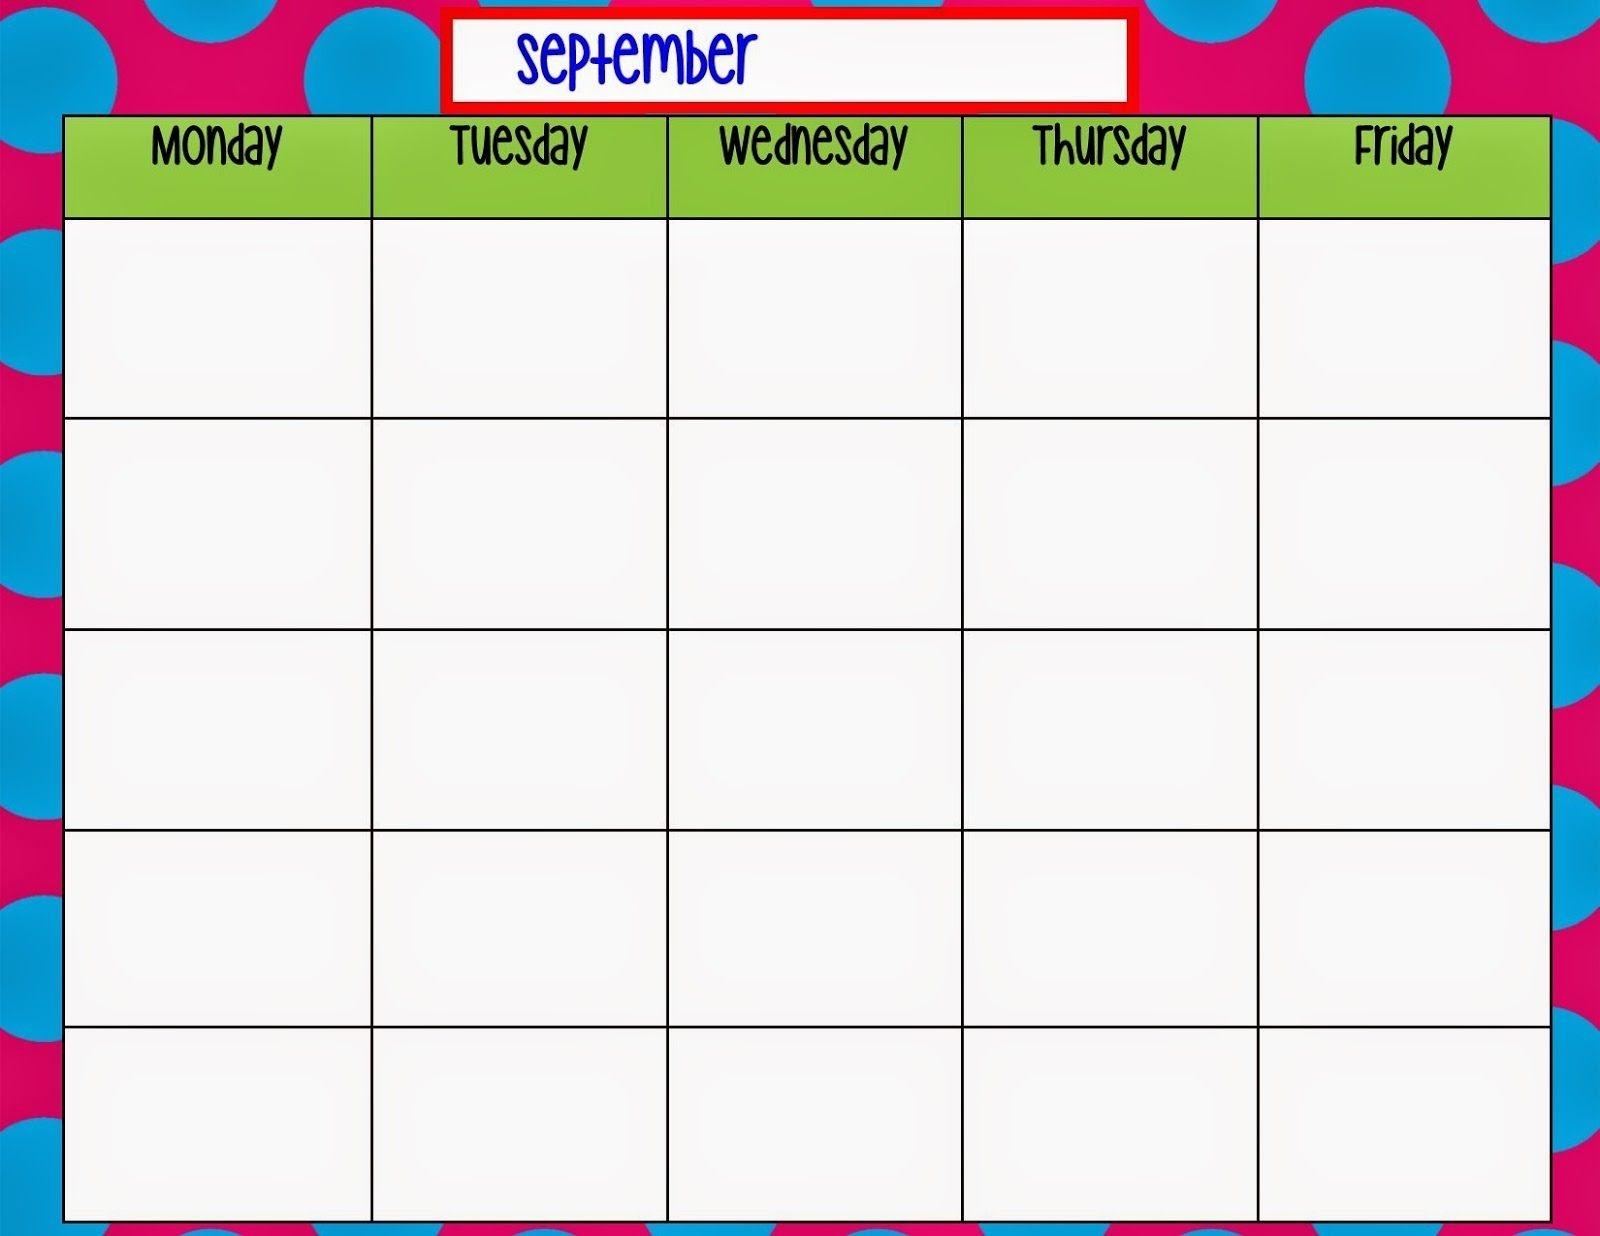 Monday Through Friday Calendar Template | Weekly Calendar-Monday To Friday Template